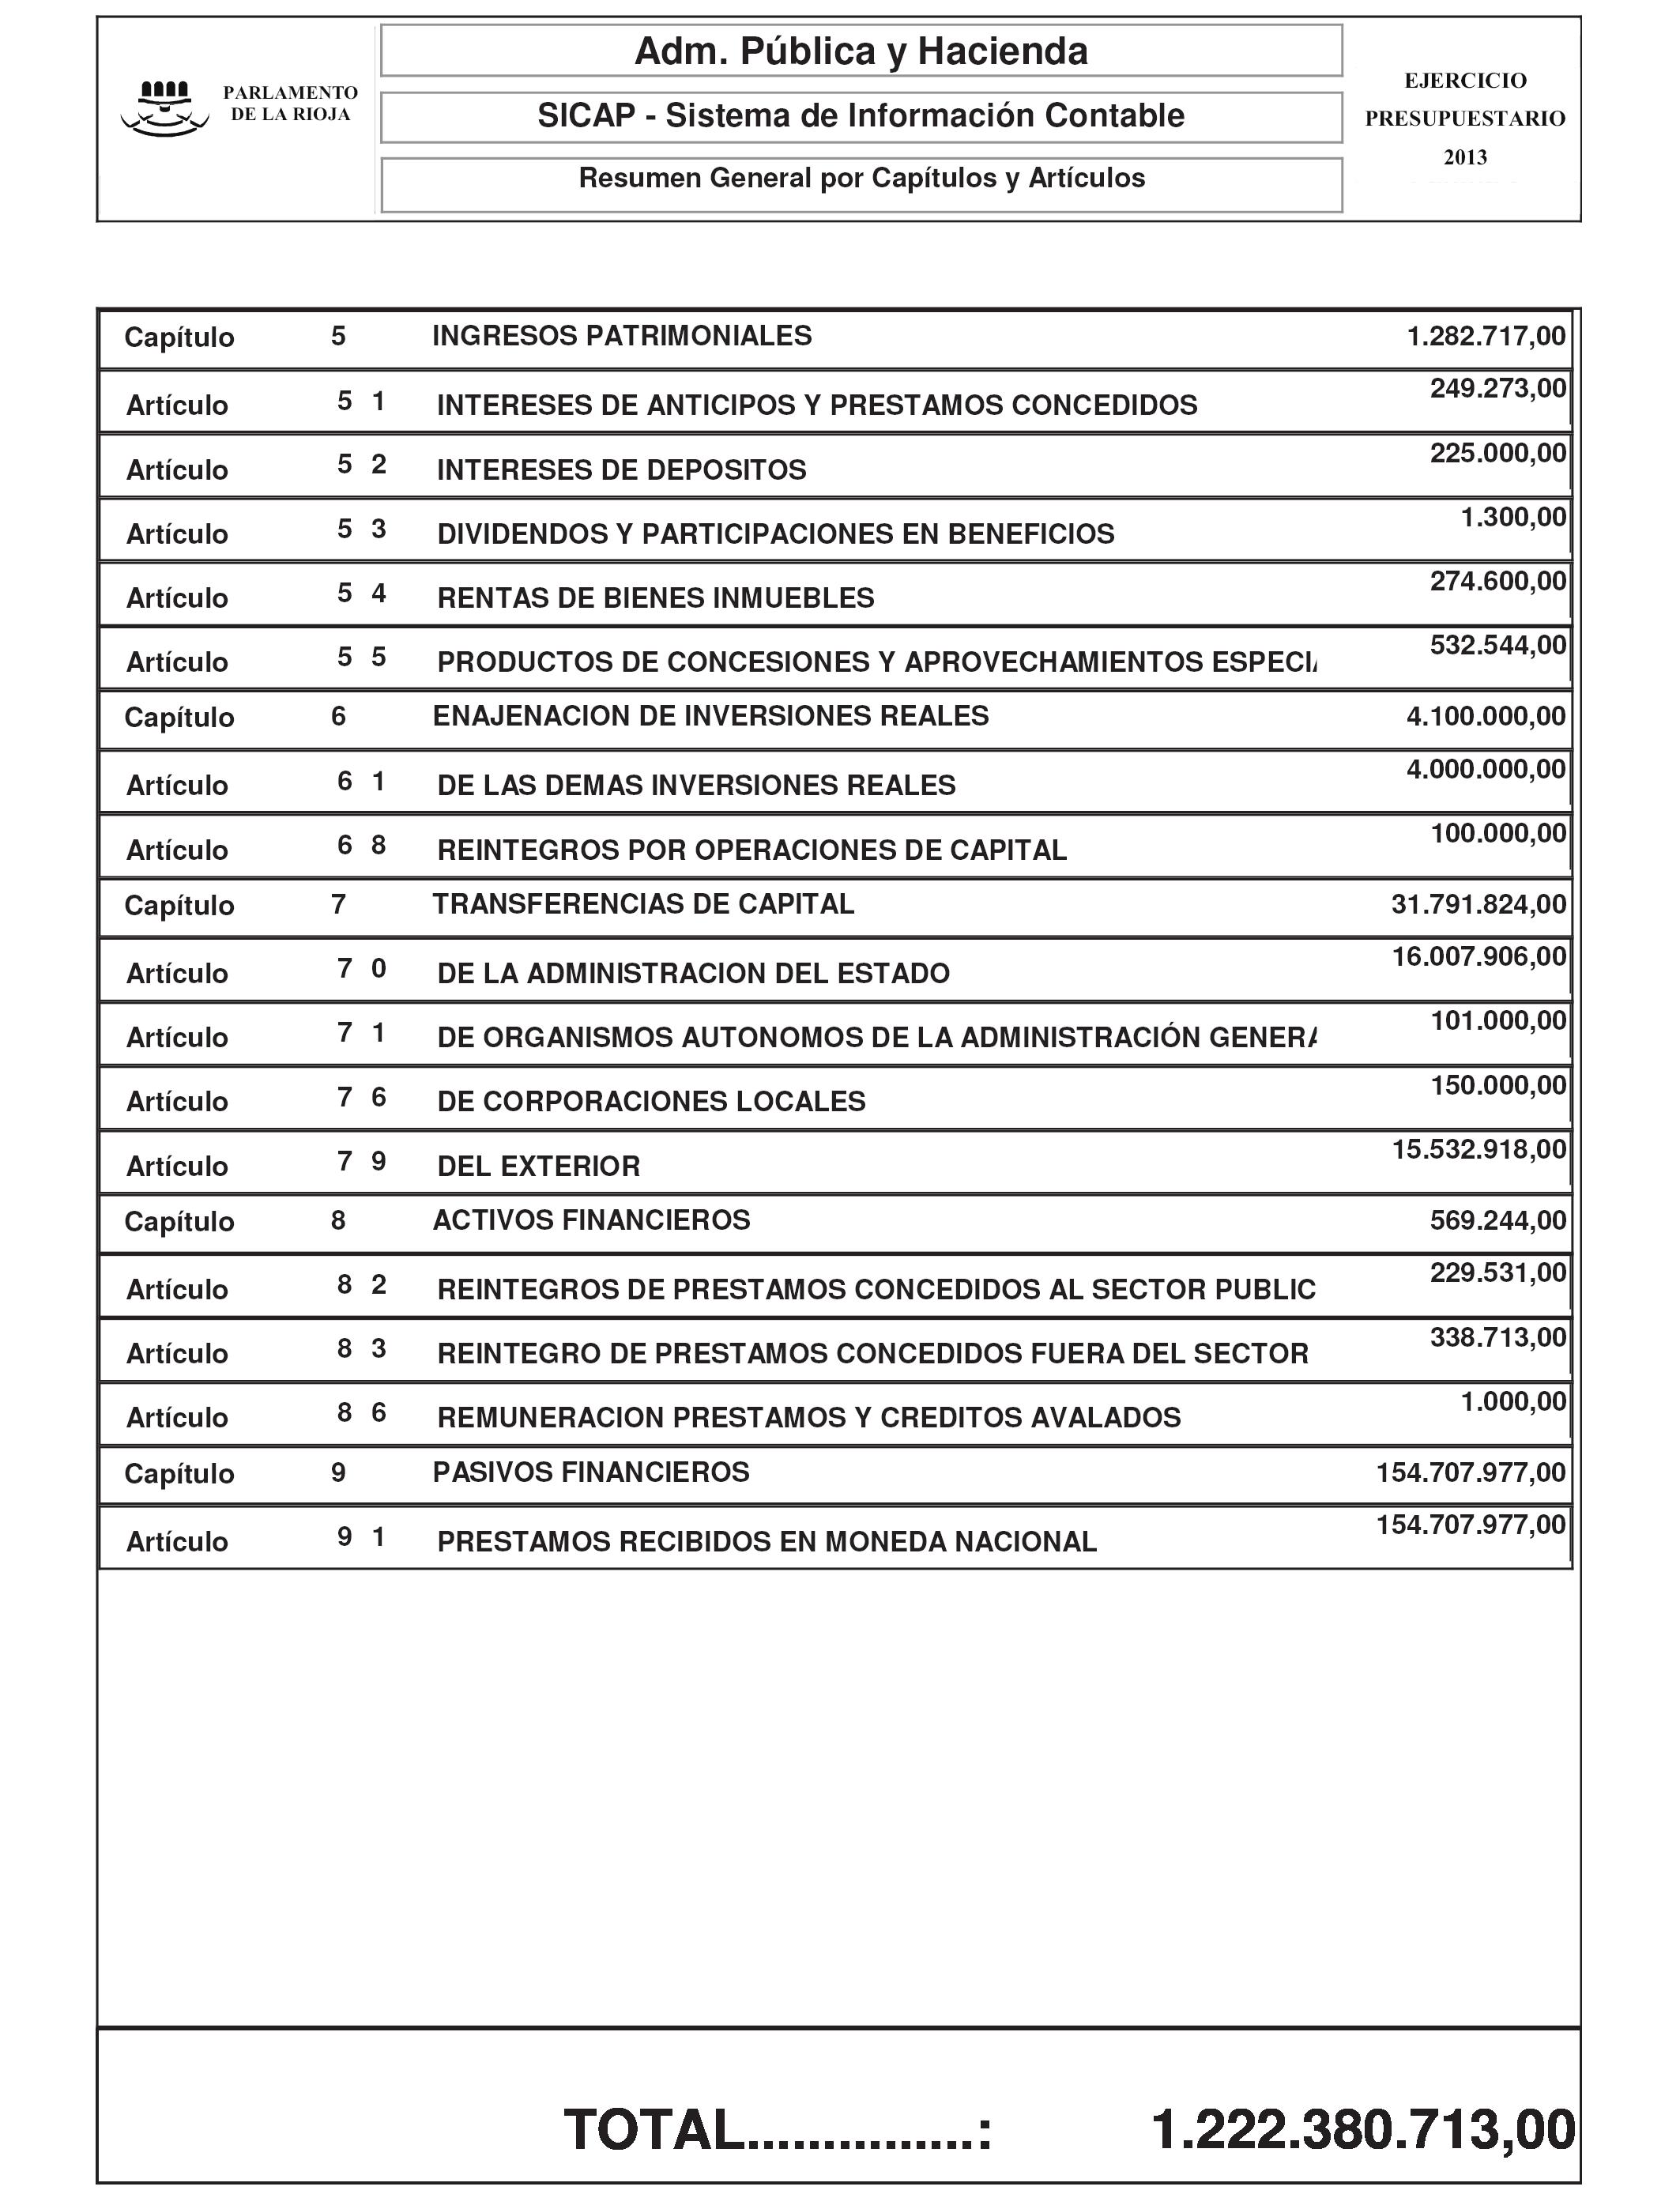 Boe Es Documento Boe A 2013 451